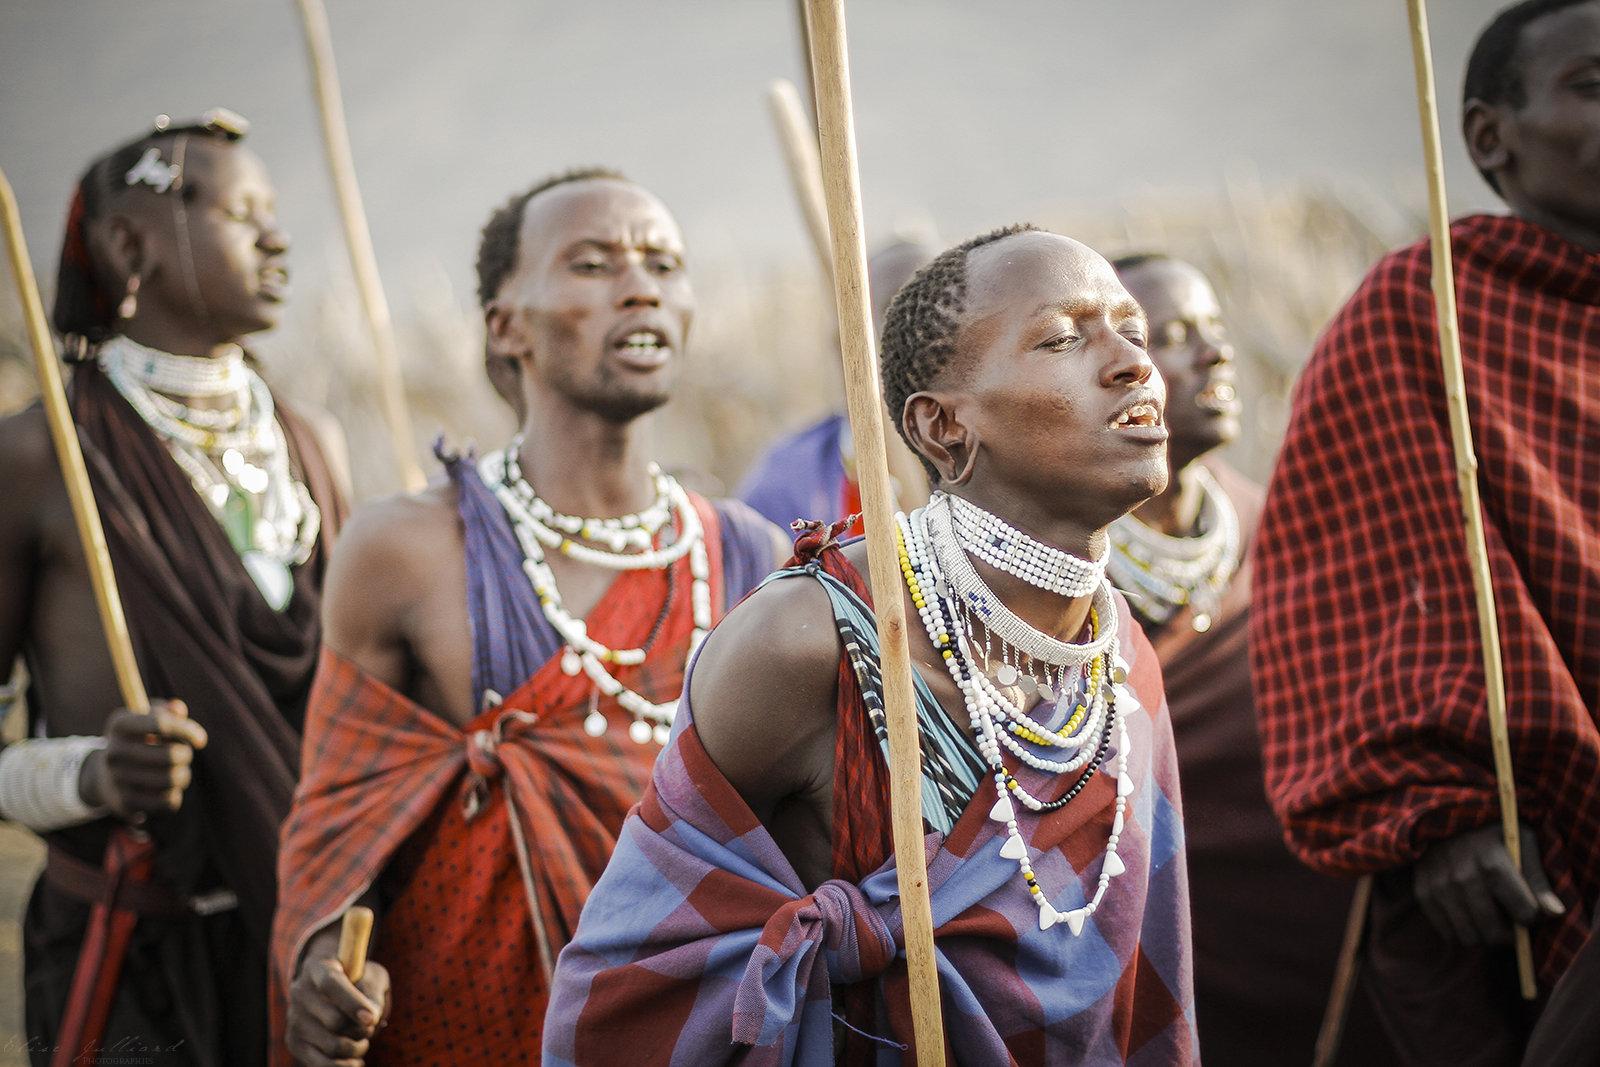 elise-julliard-photographe-guerriers-maasai-lac-natron-tanzanie-afrique